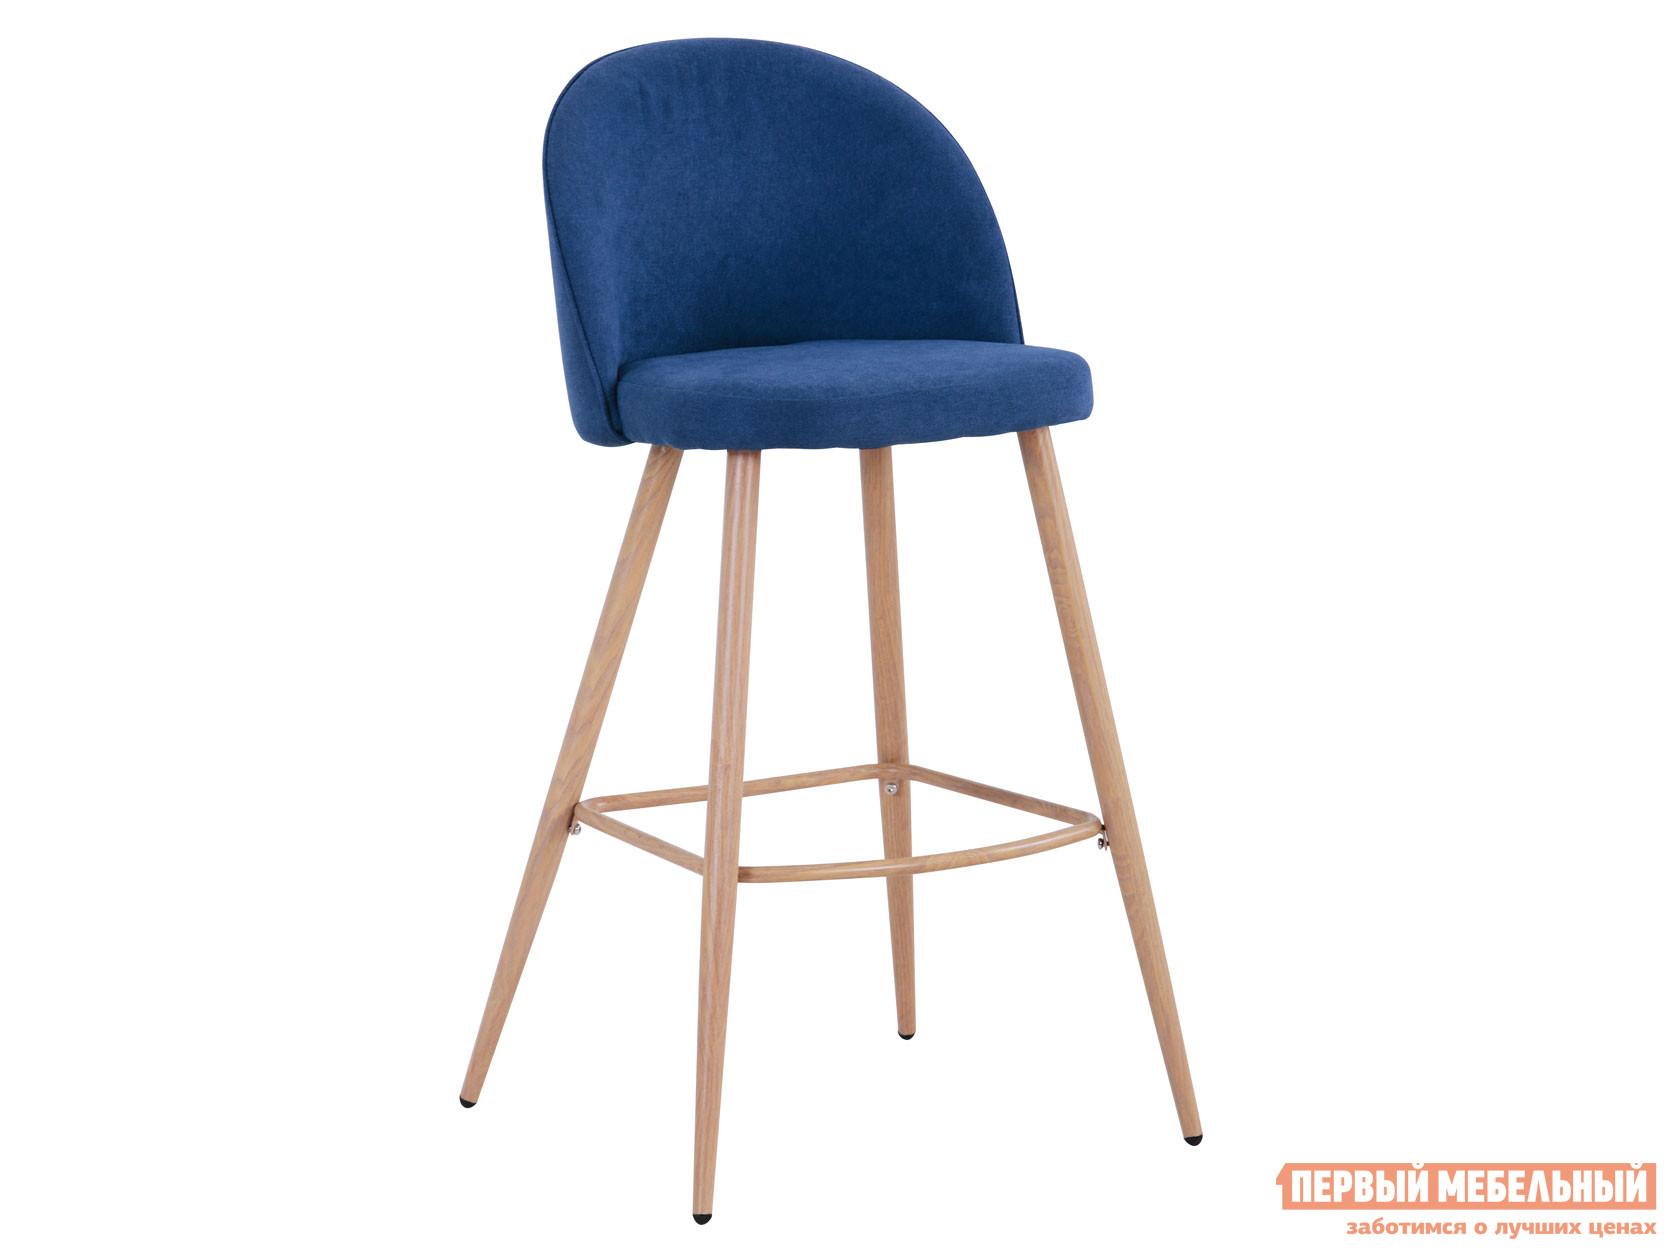 Барный стул  Лион BC-99004 Синий, шенилл / Светлое дерево Stool Group 116266